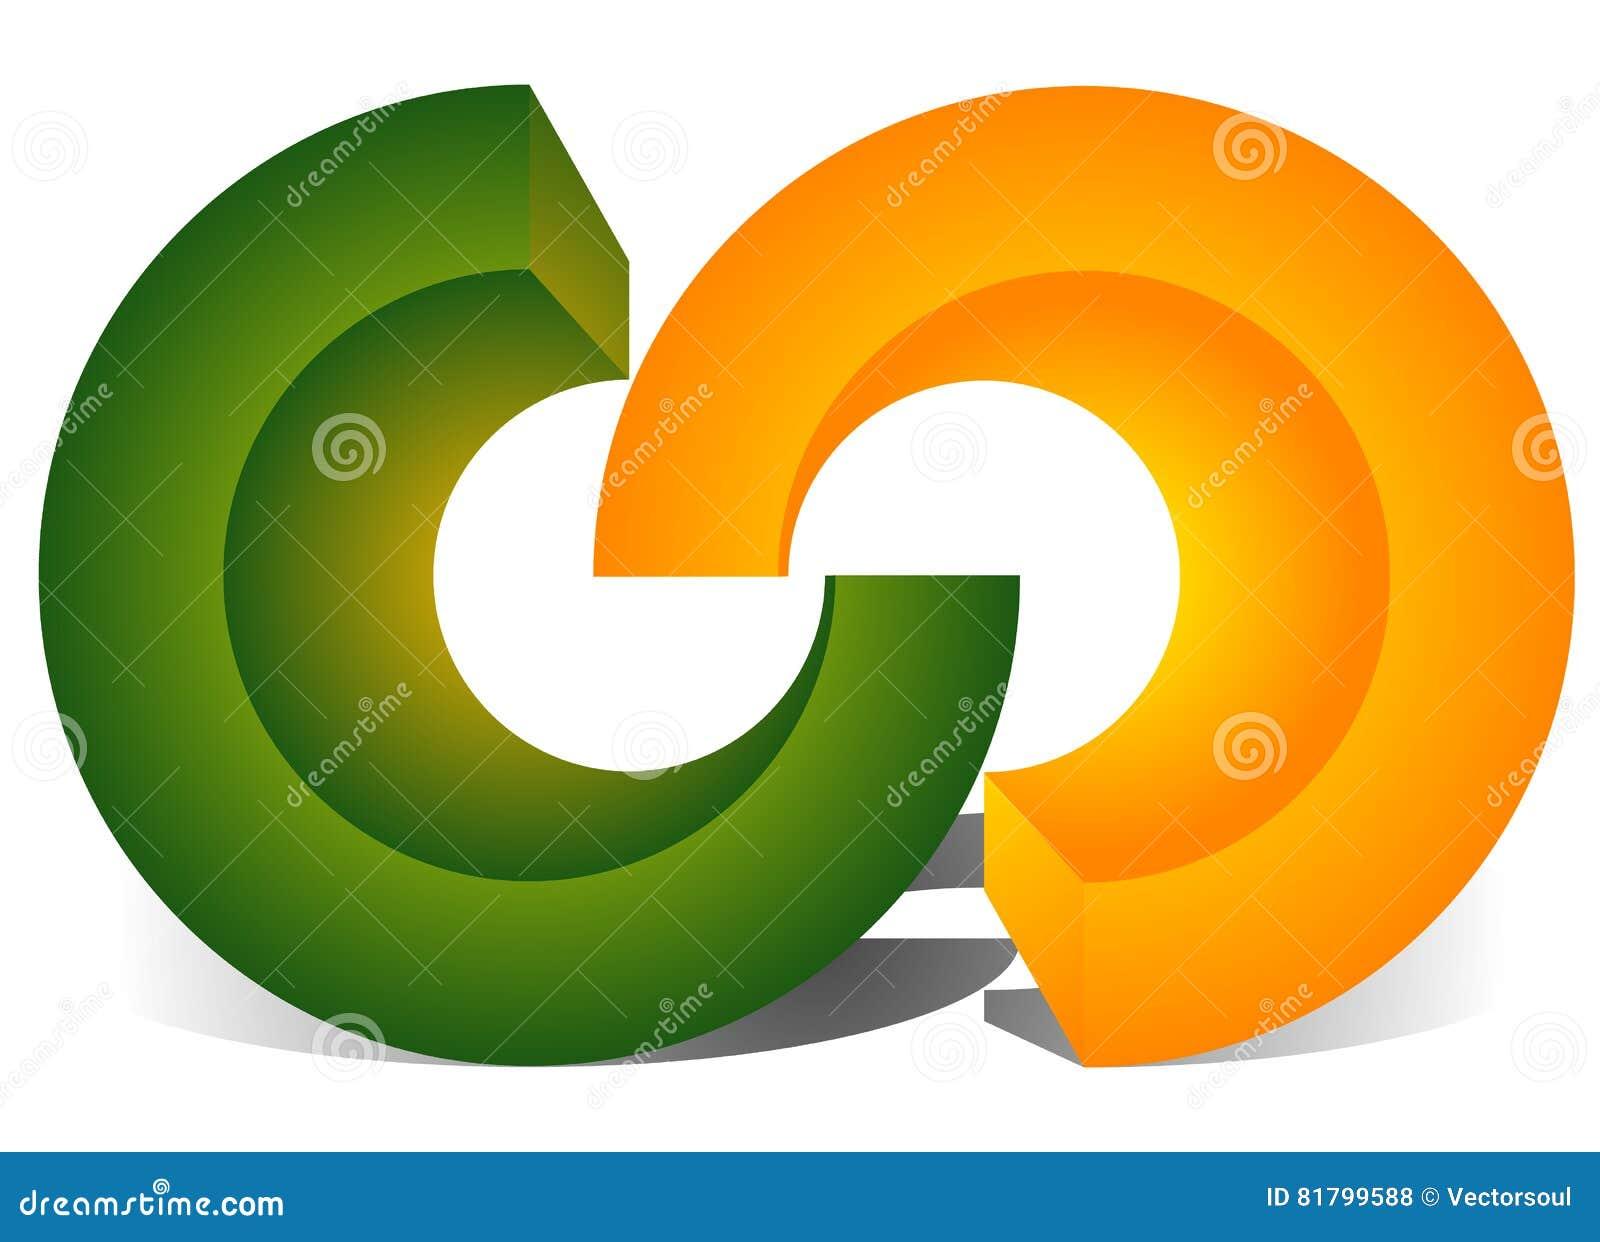 Interlocking circles, interlocking rings as abstract connection,